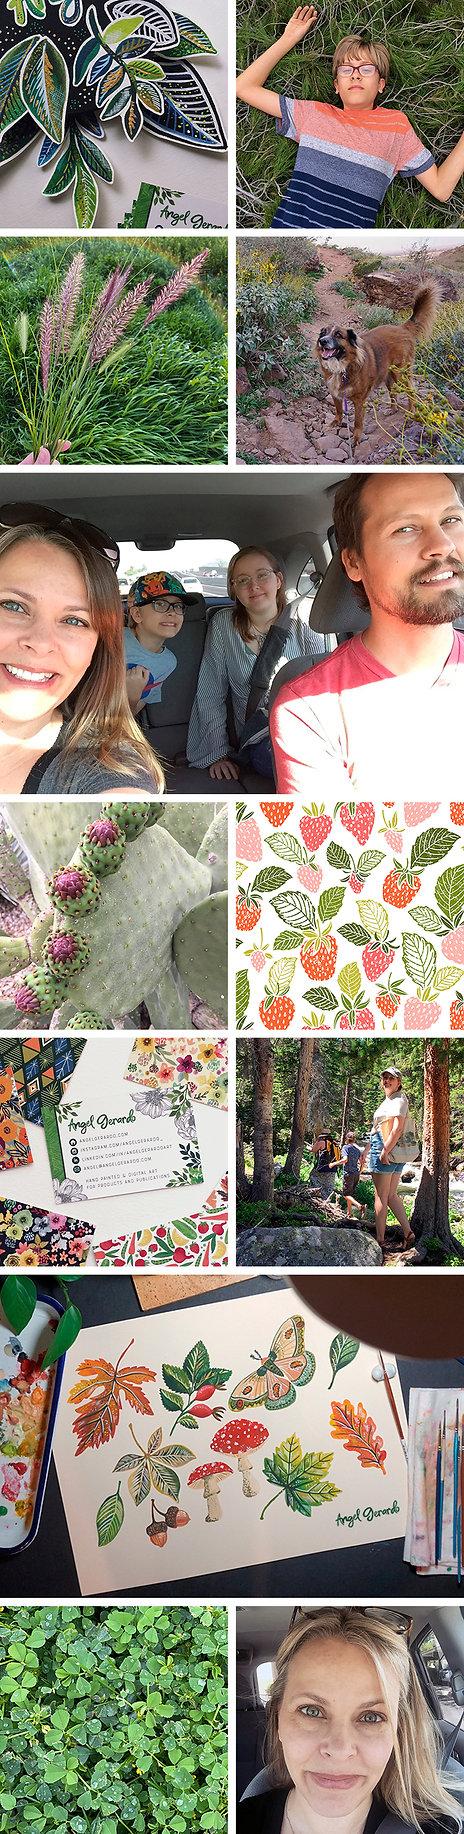 Angel Gerardo Artist, photos of family, art and plants.